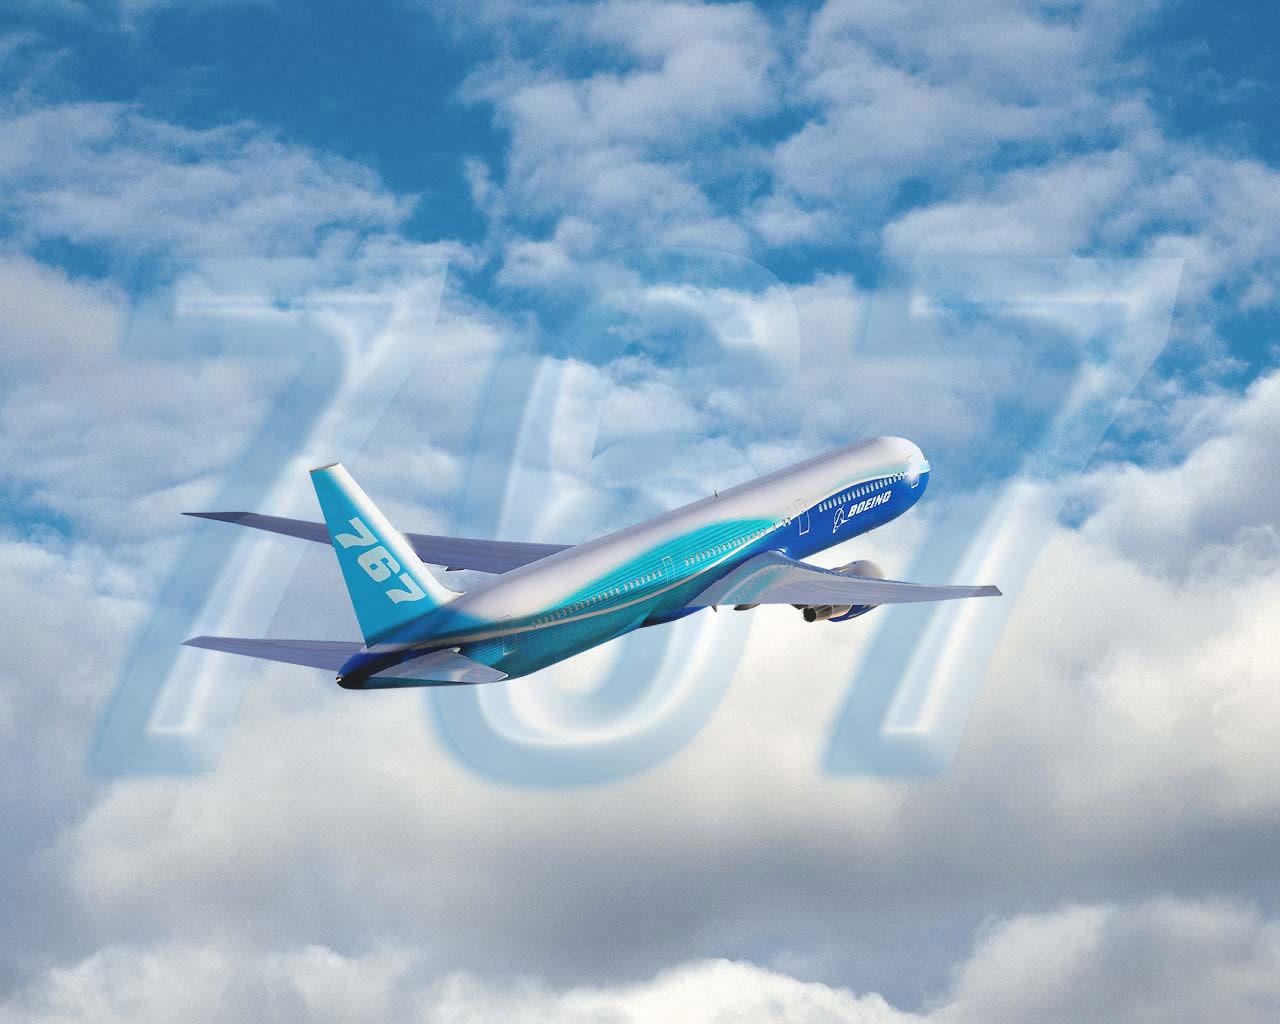 aeroplane wallpapers in hdaeroplane - photo #28